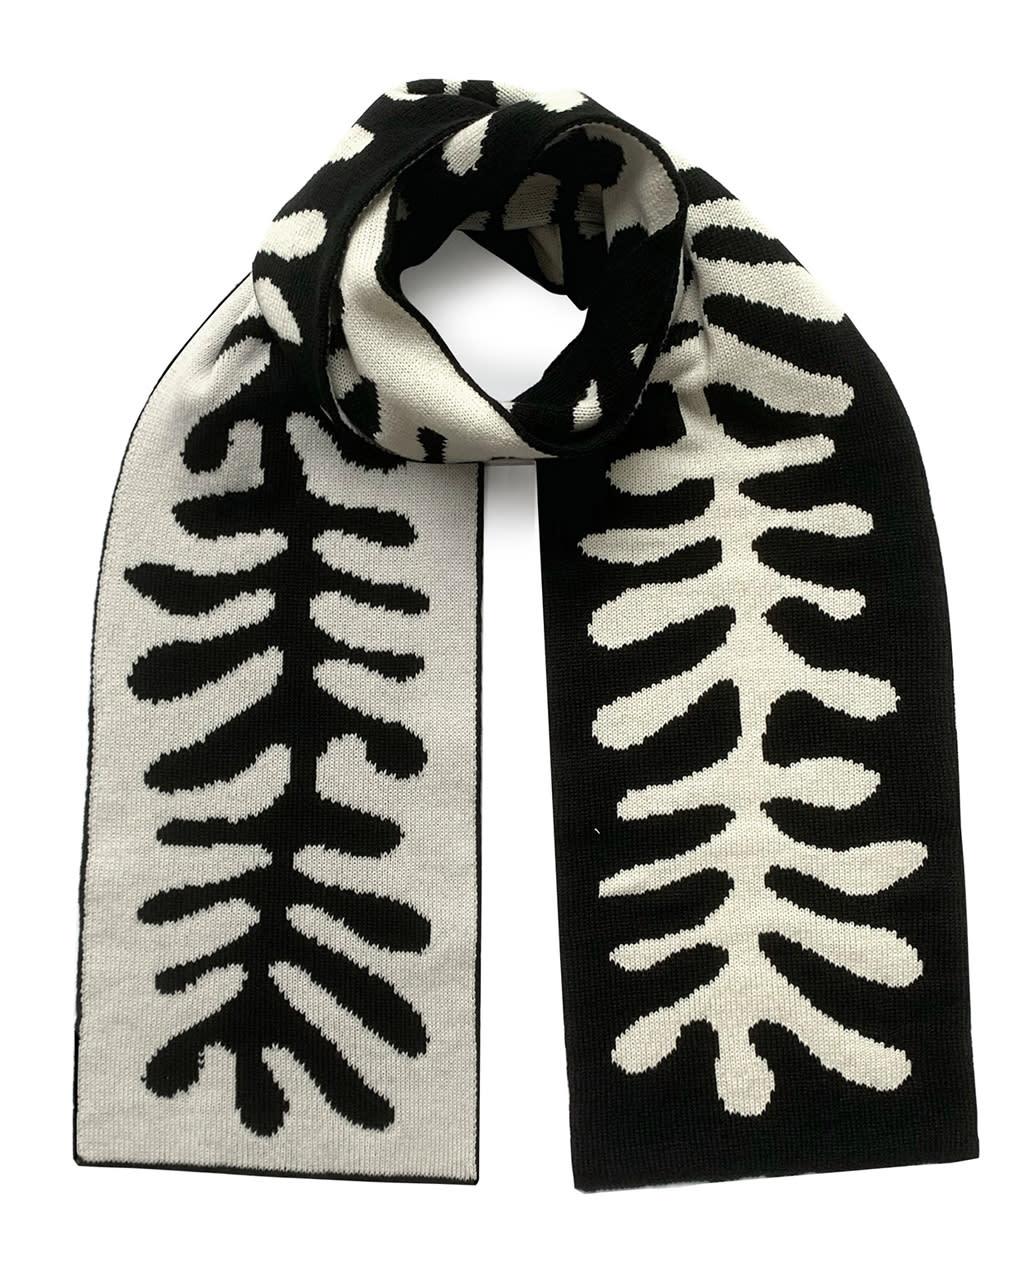 Organic Shape Wool & Cashmere Scarf